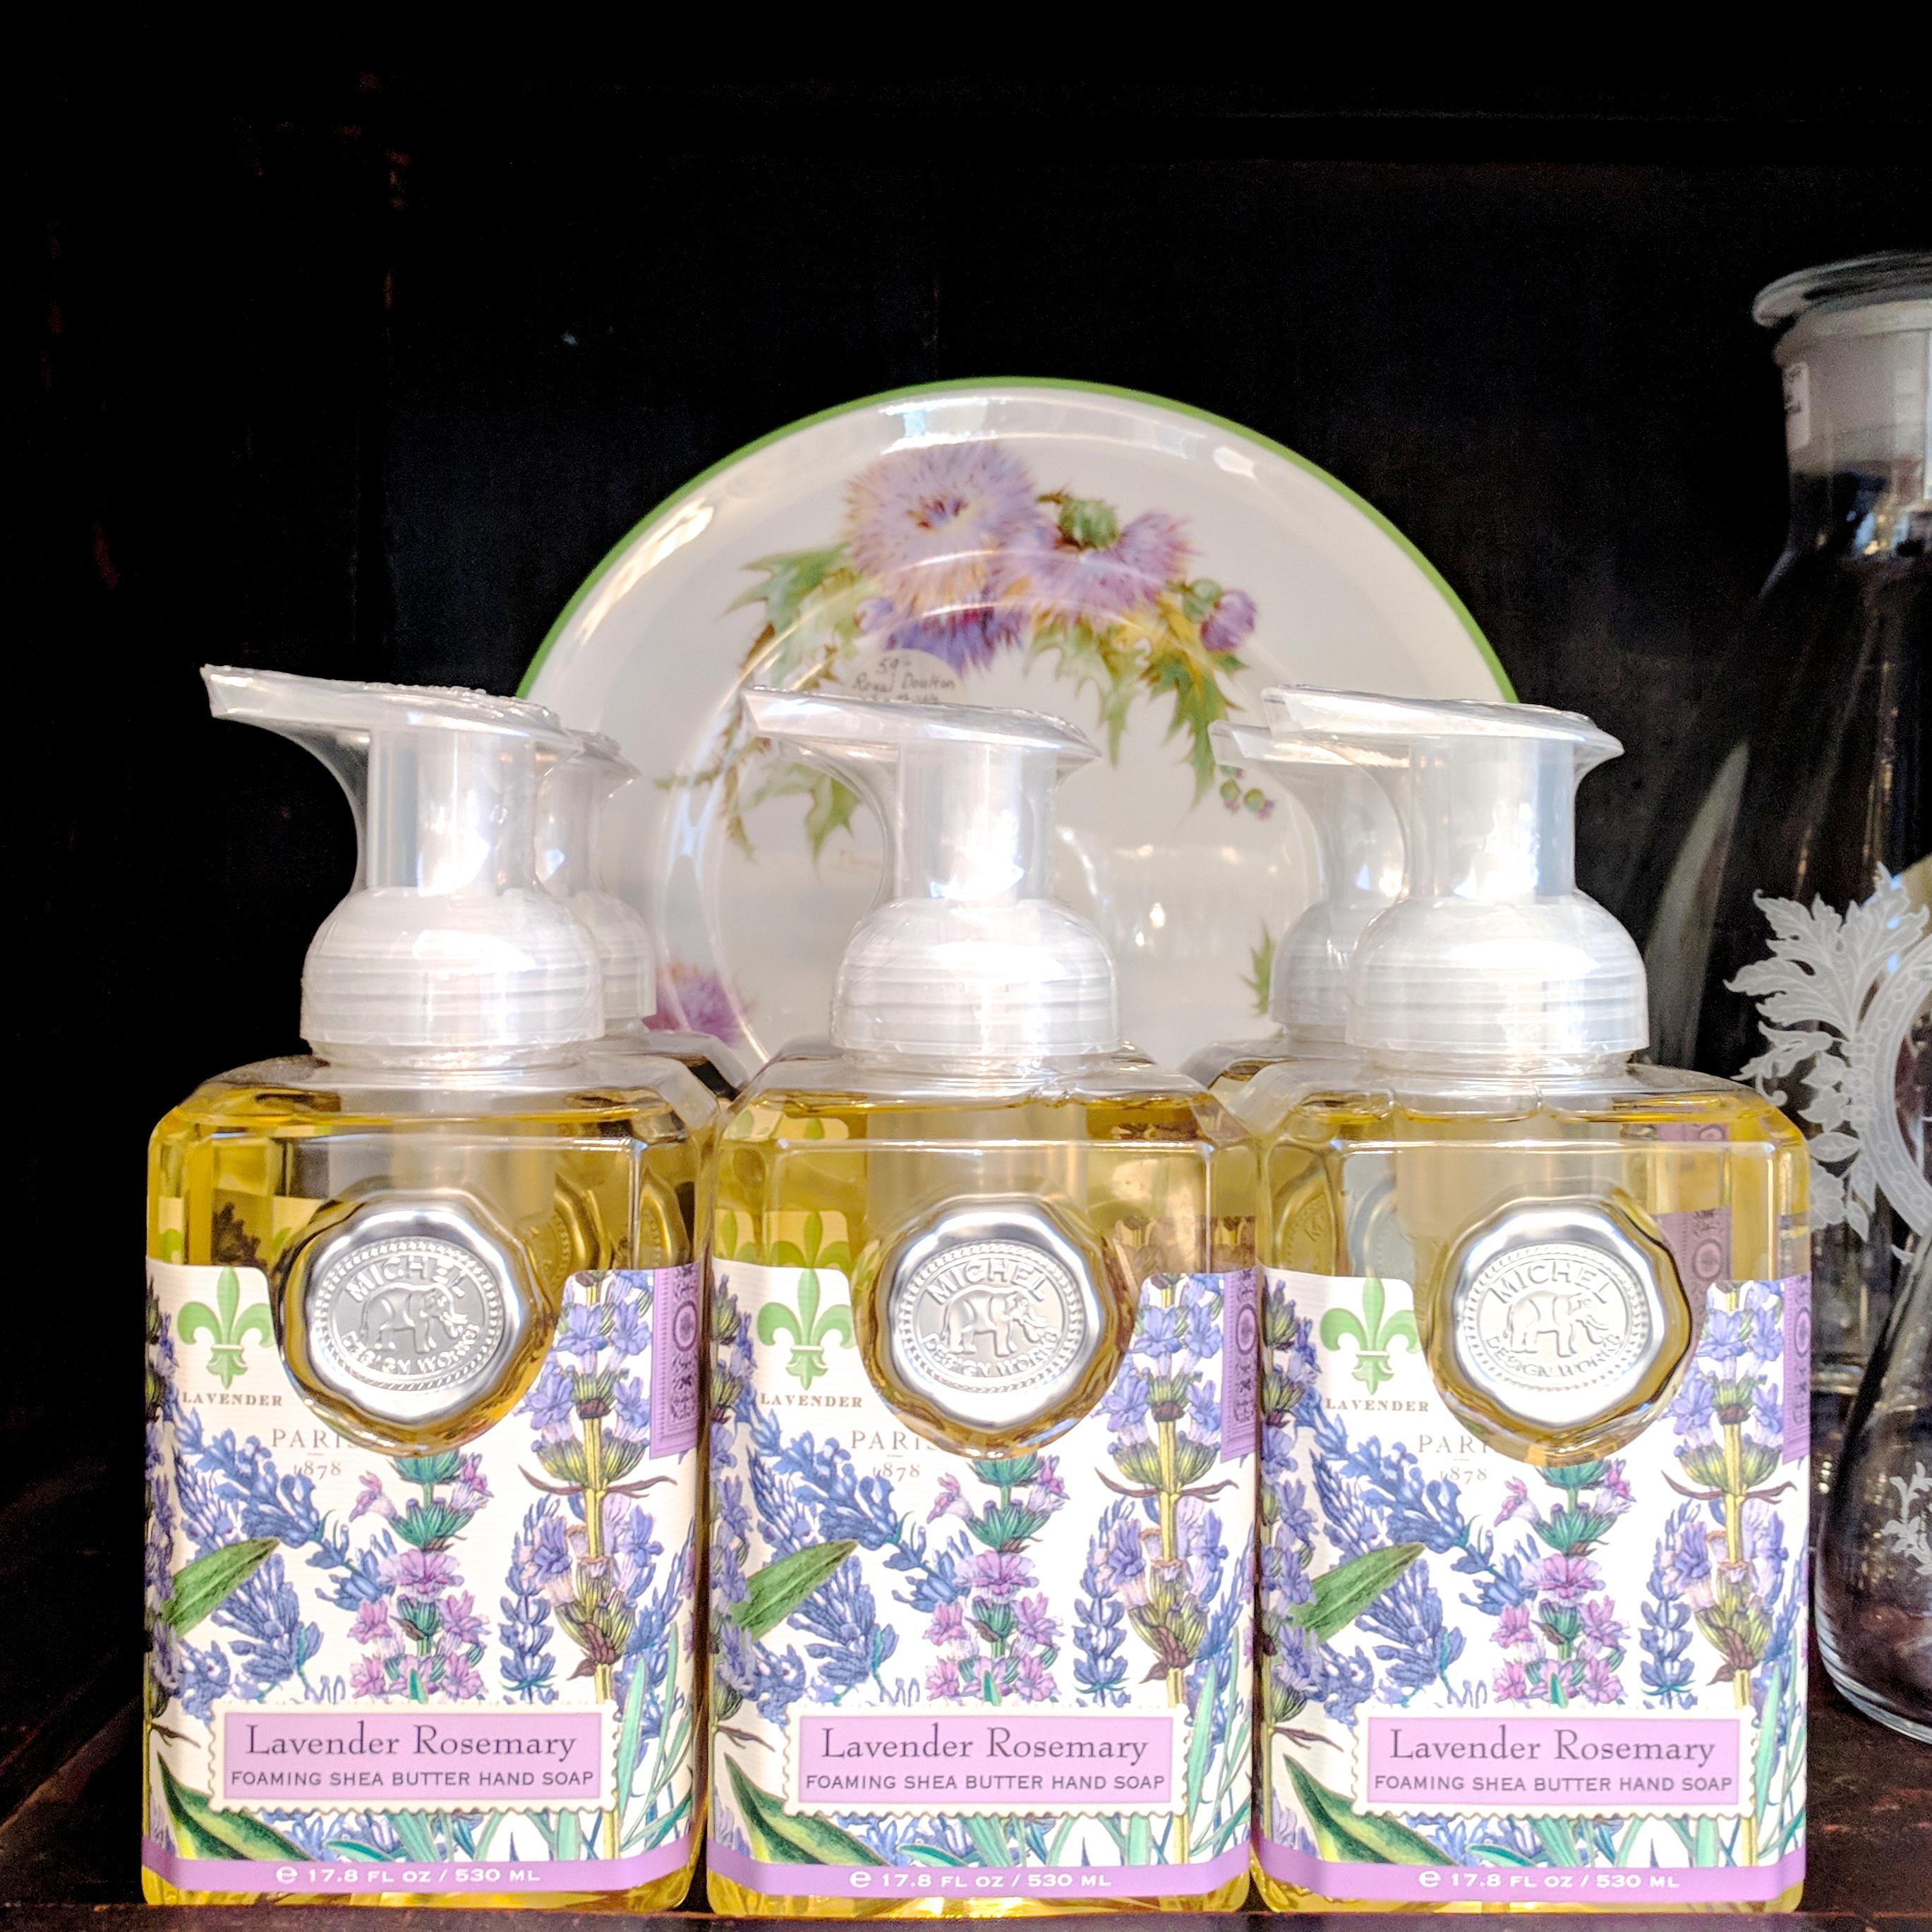 Lavender & Rosemary Foaming Soap